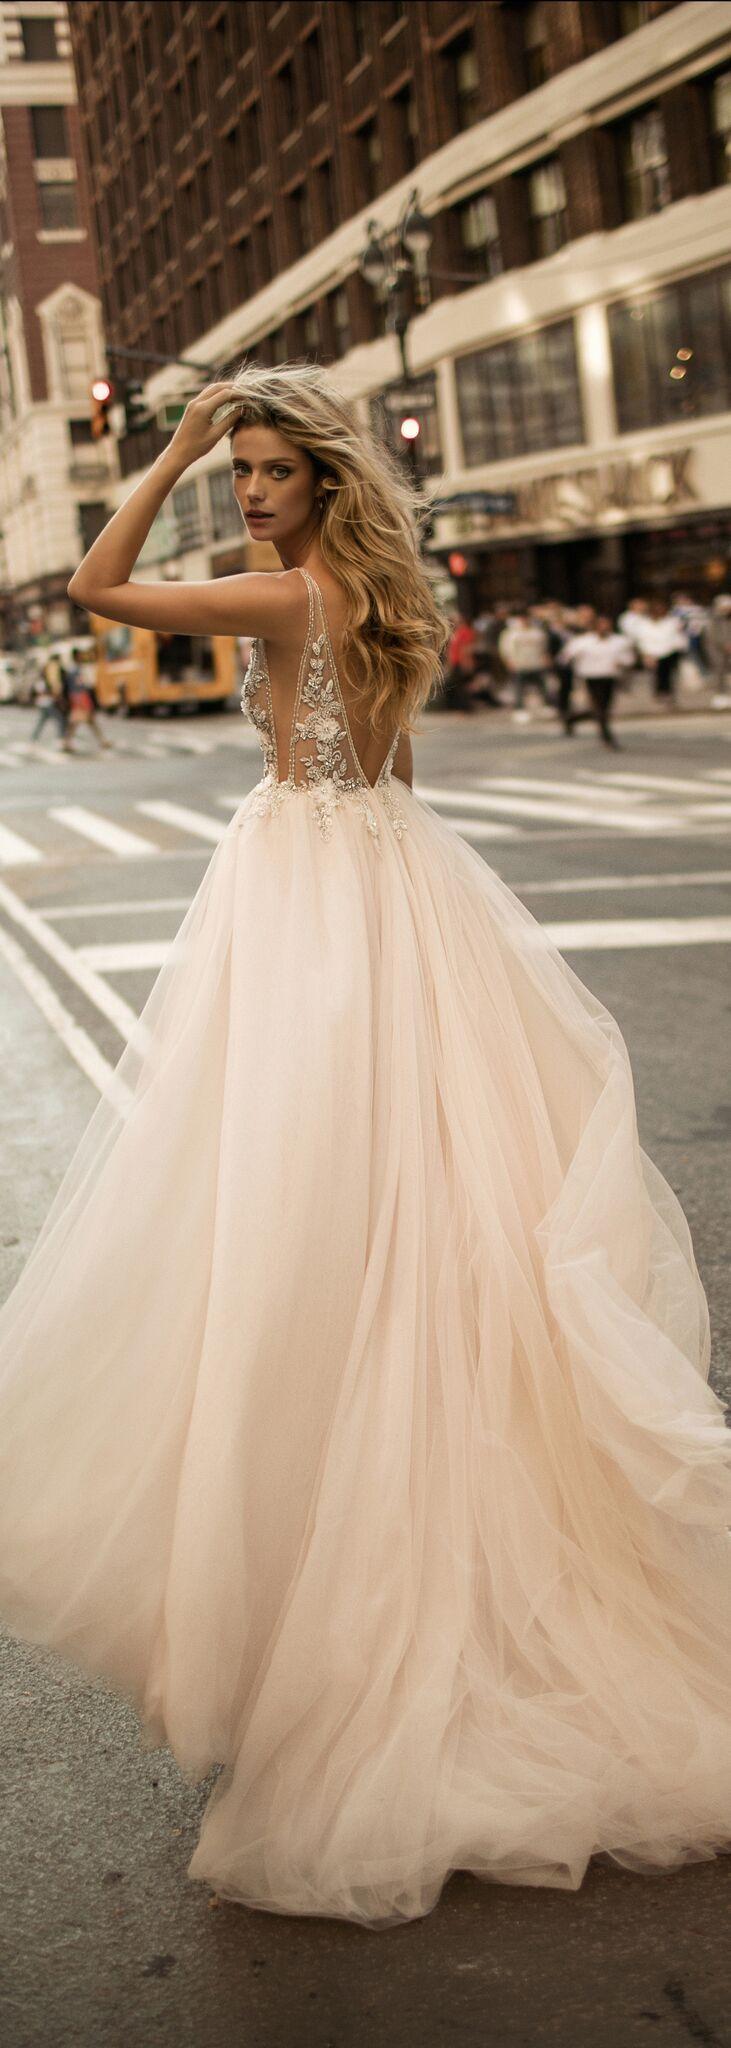 best wedding images on pinterest hairstyle ideas wedding